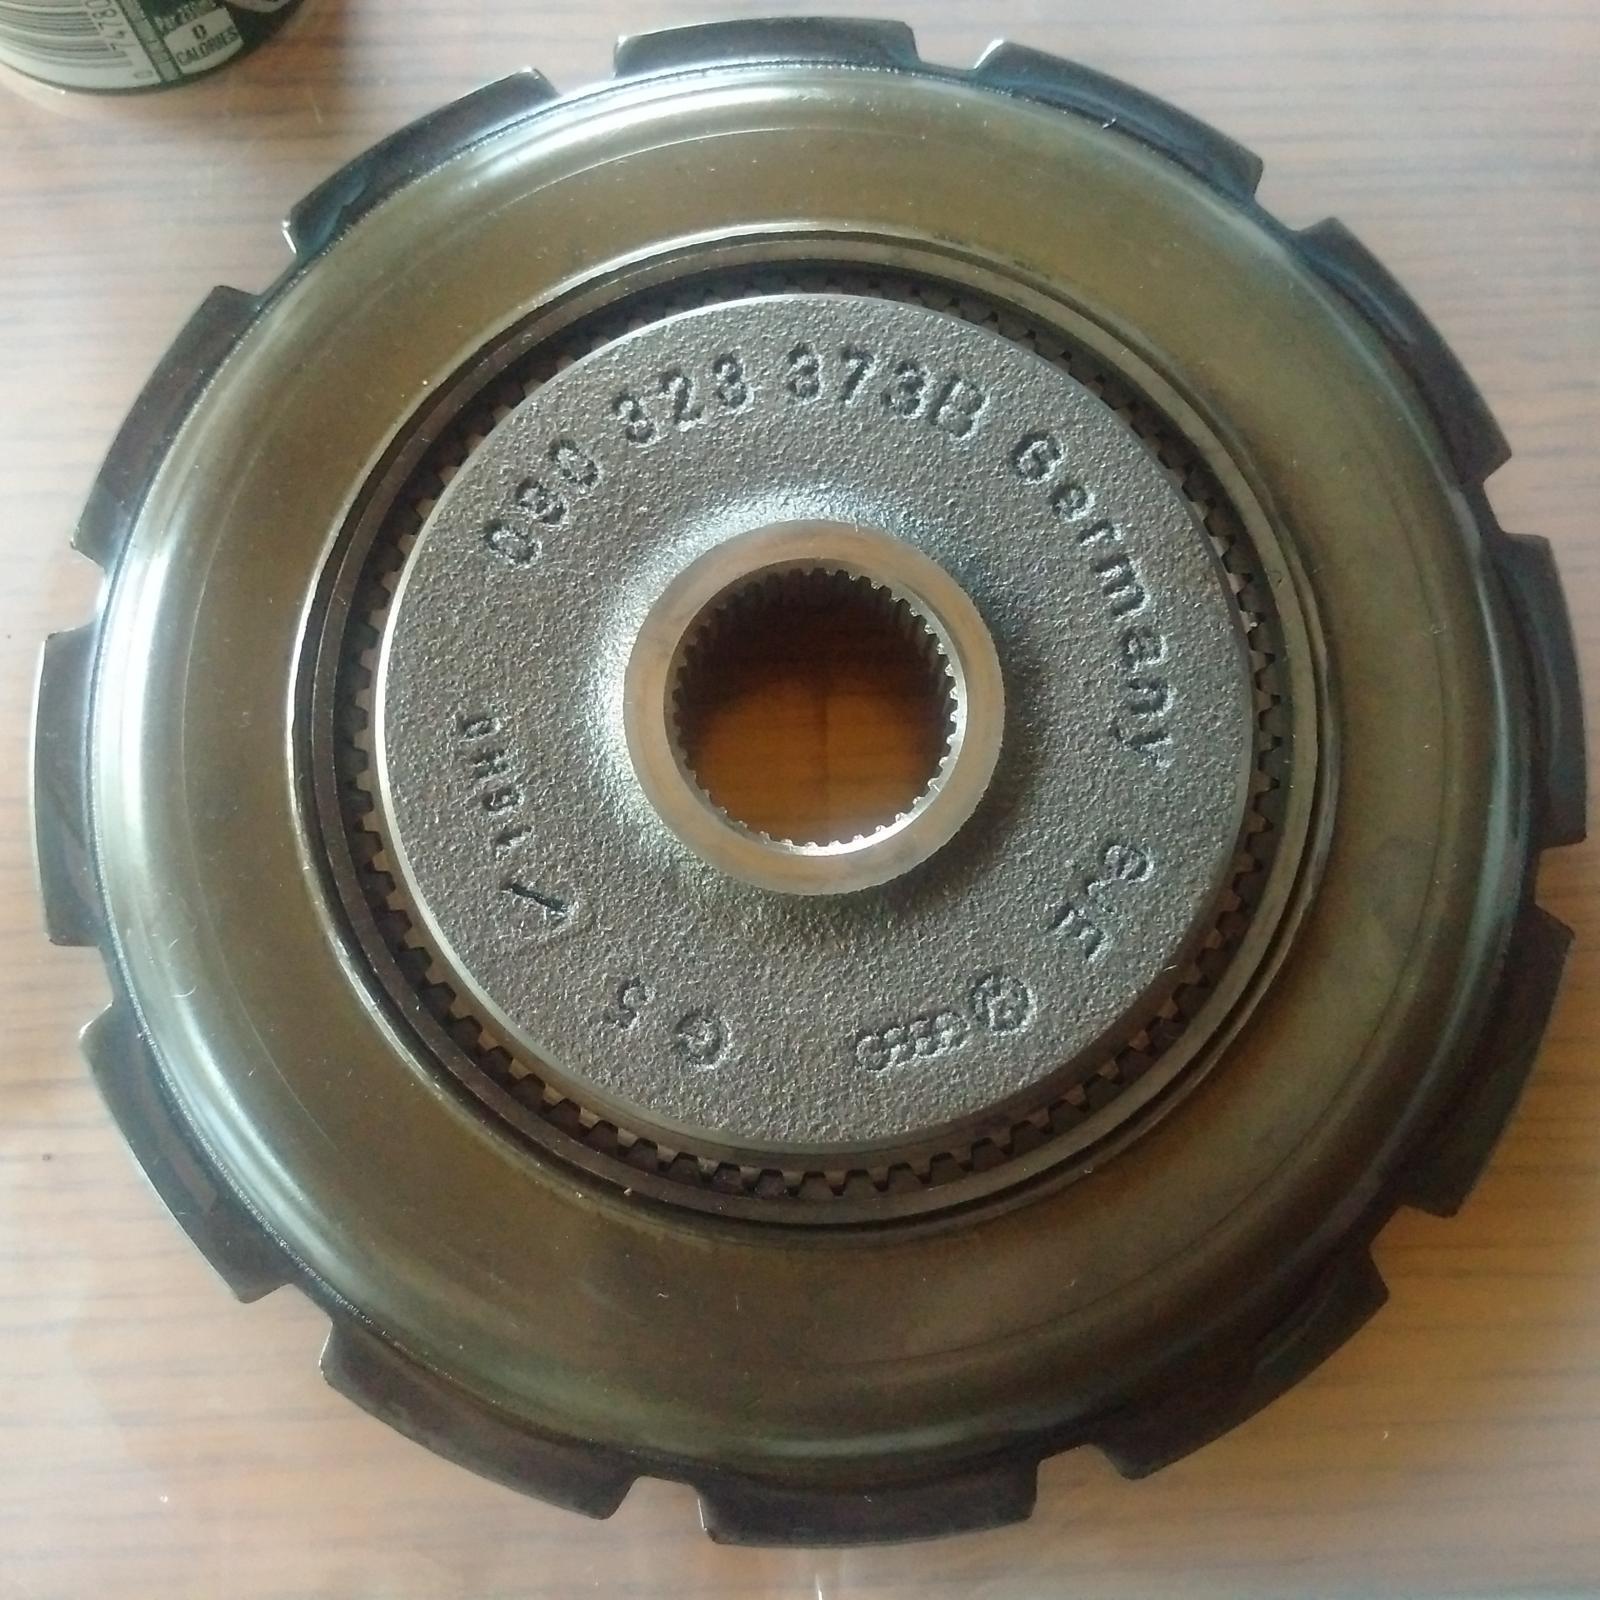 010 Automatic Vanagon Parts Audi 5000T Upgrade